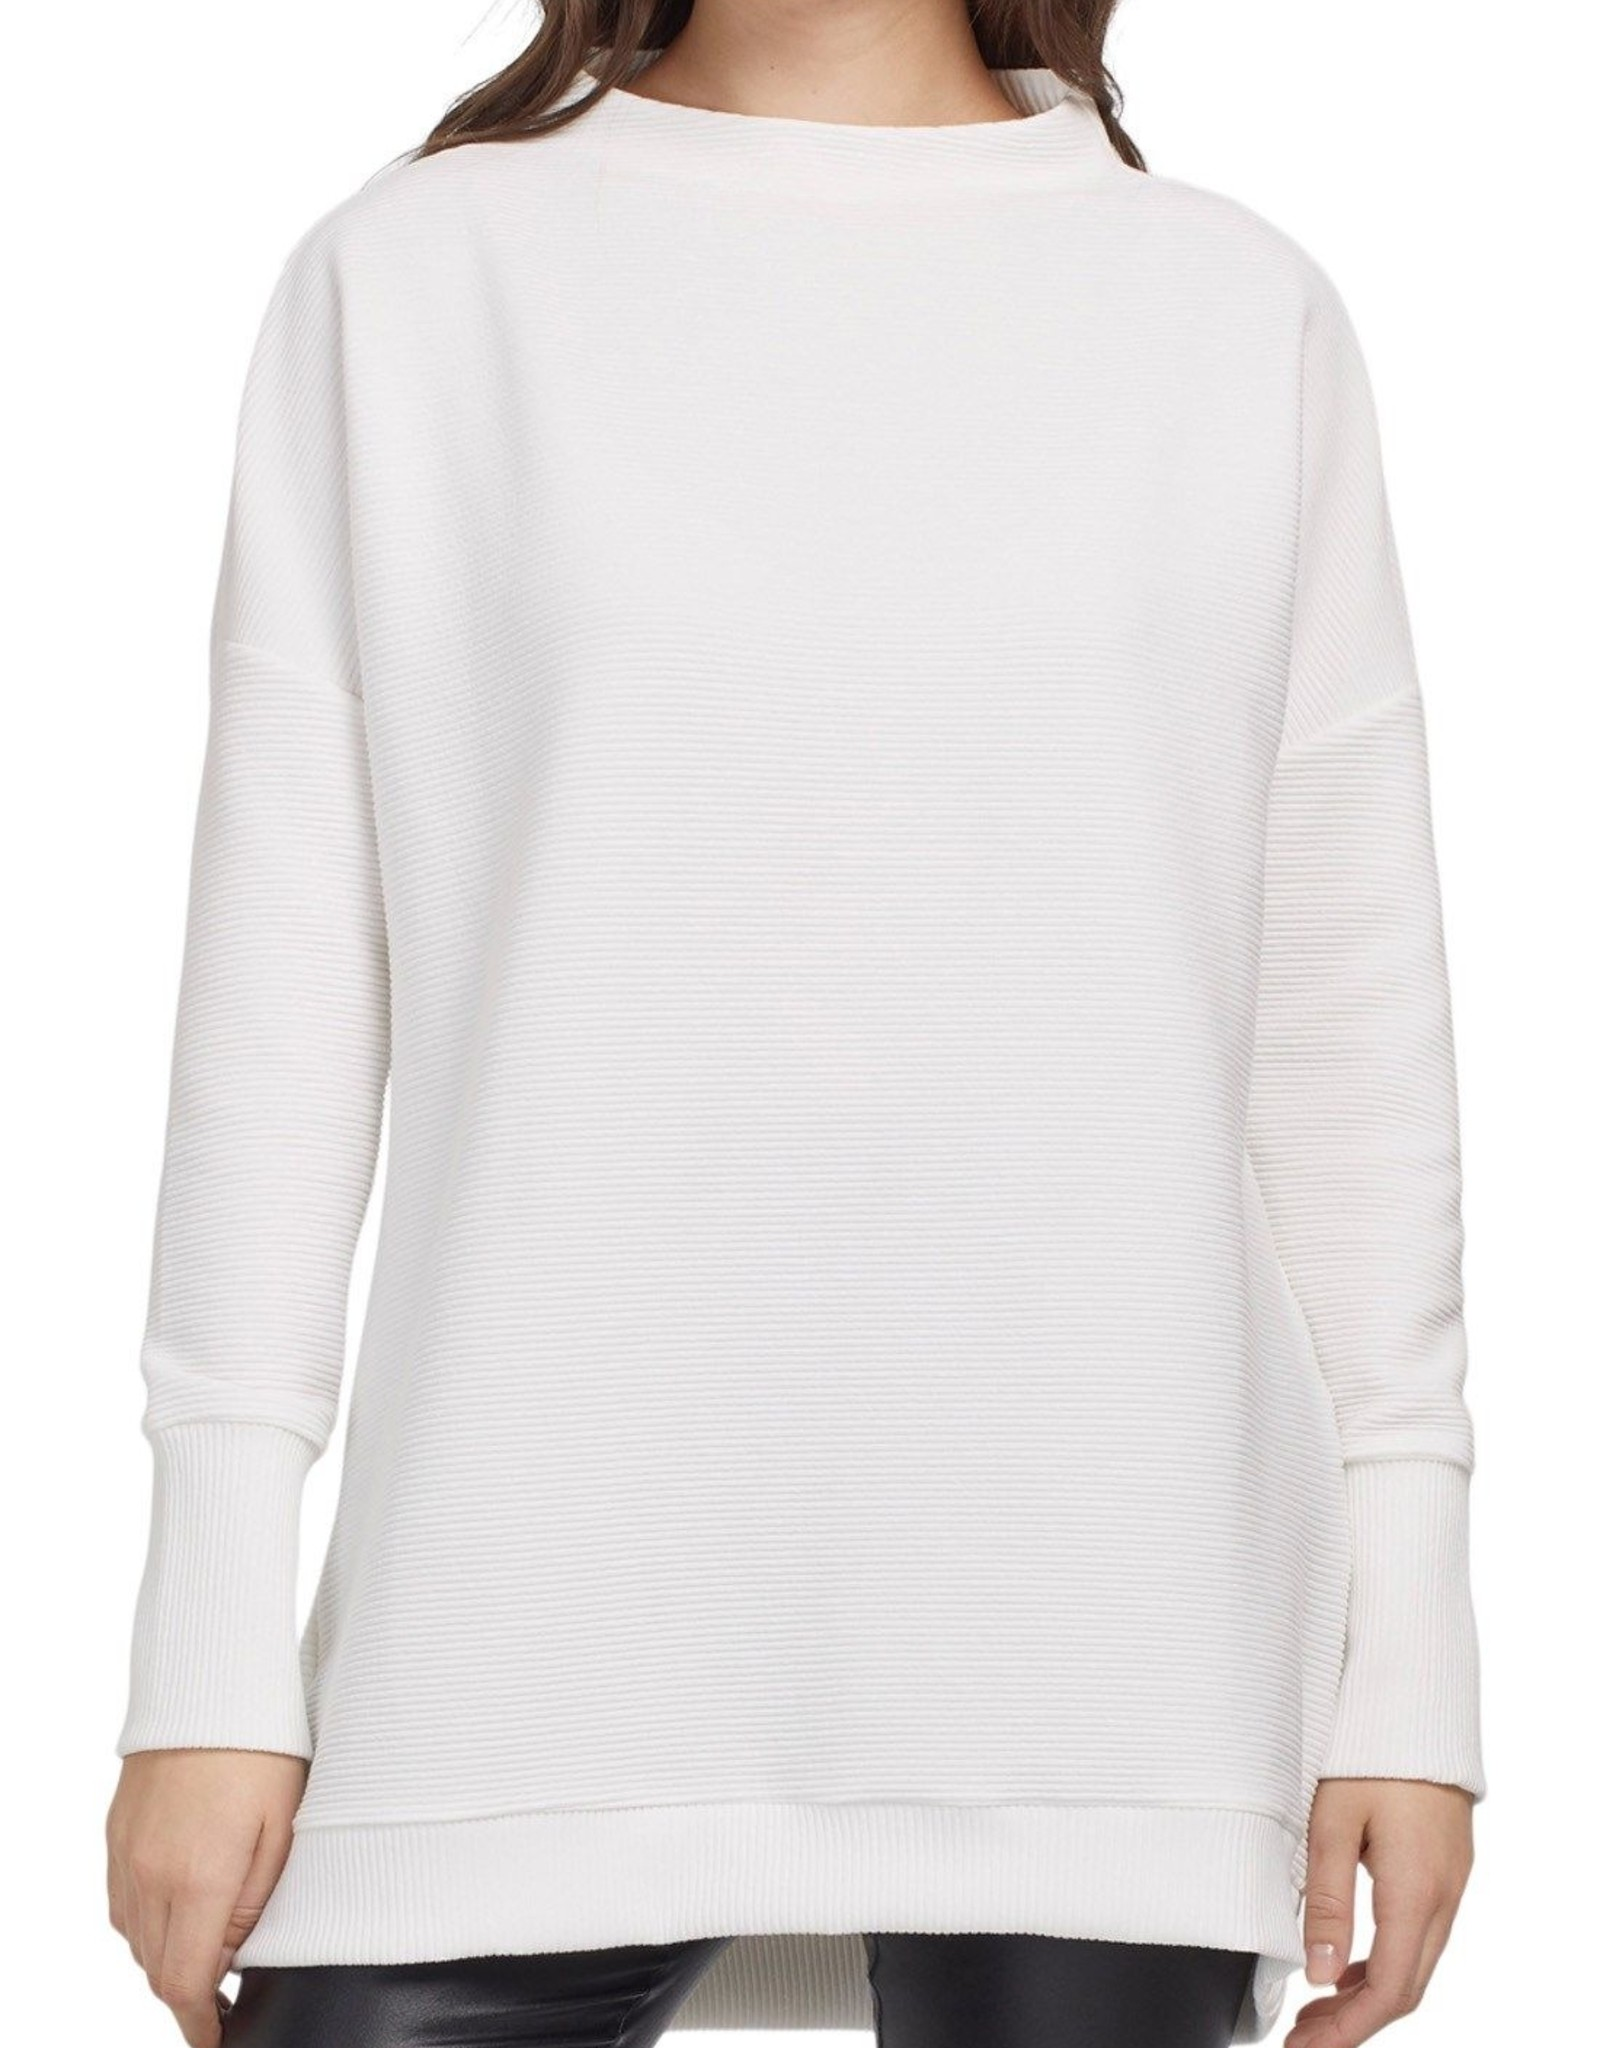 Tribal Ottoman Sweater 6850O